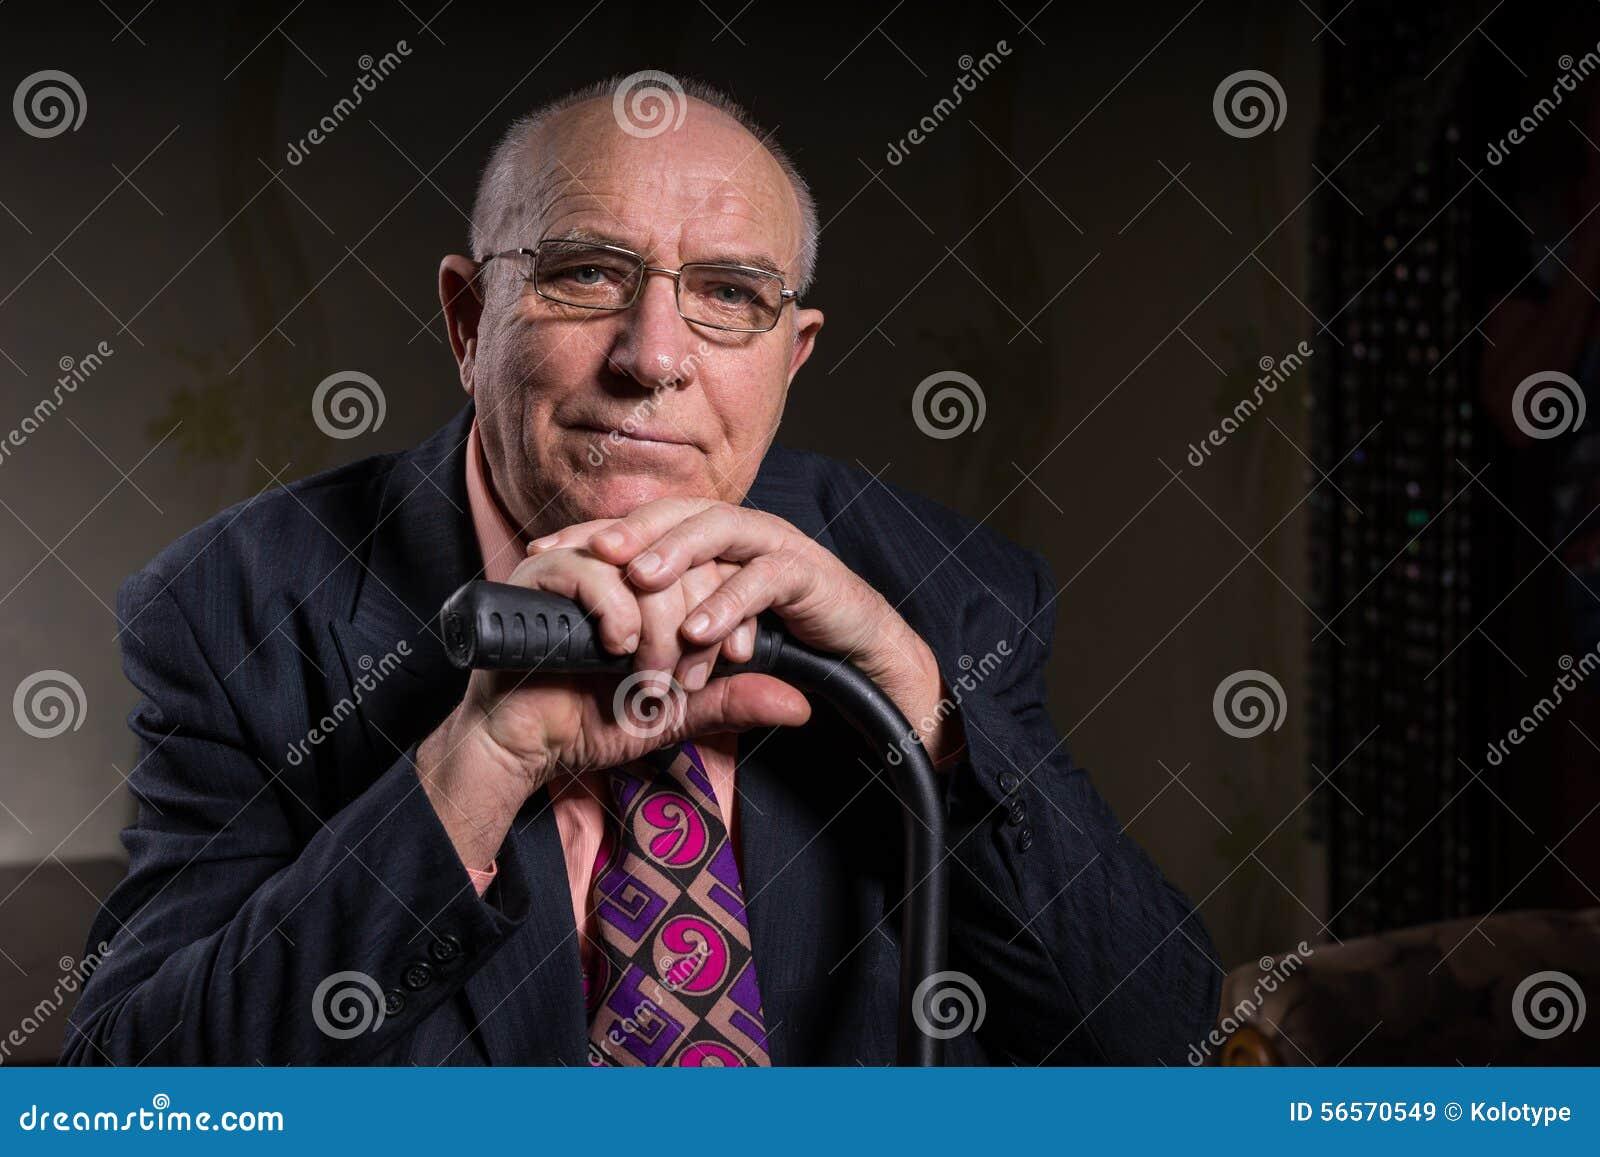 Download Χαμογελώντας παλαιός φαλακρός επιχειρηματίας που κρατά τον κάλαμό του Στοκ Εικόνα - εικόνα από γοητεία, πρόσχαρος: 56570549